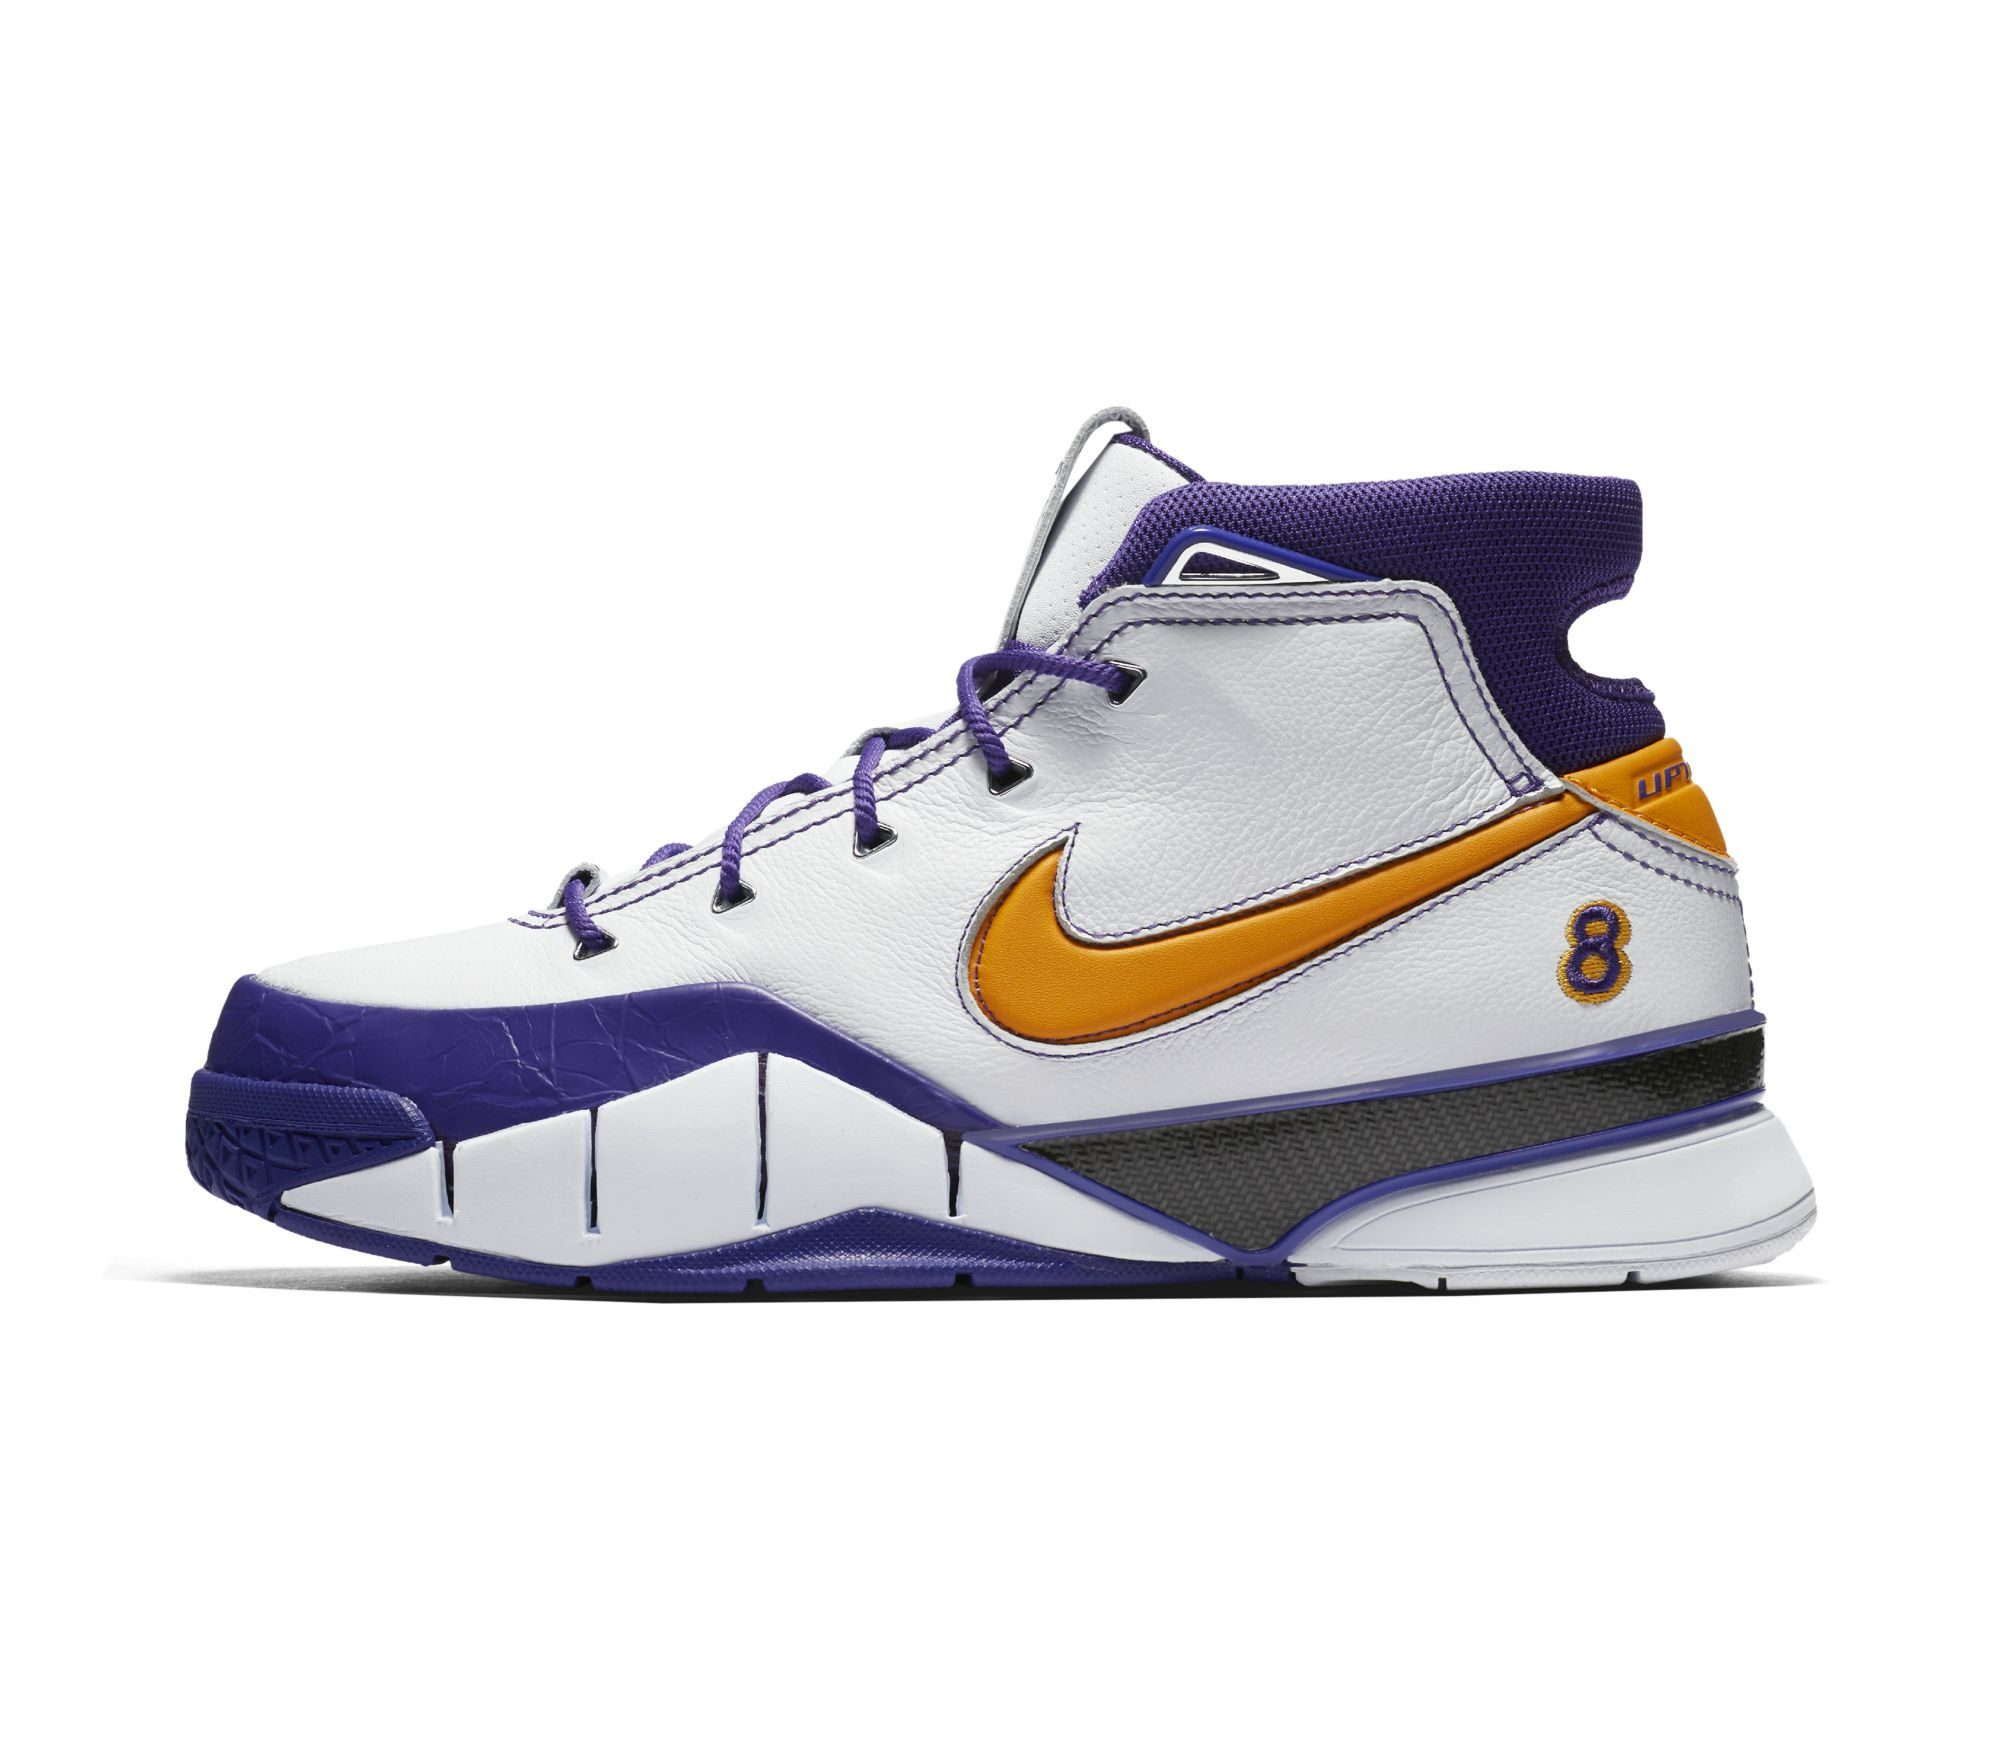 nike kobe 1 shoes